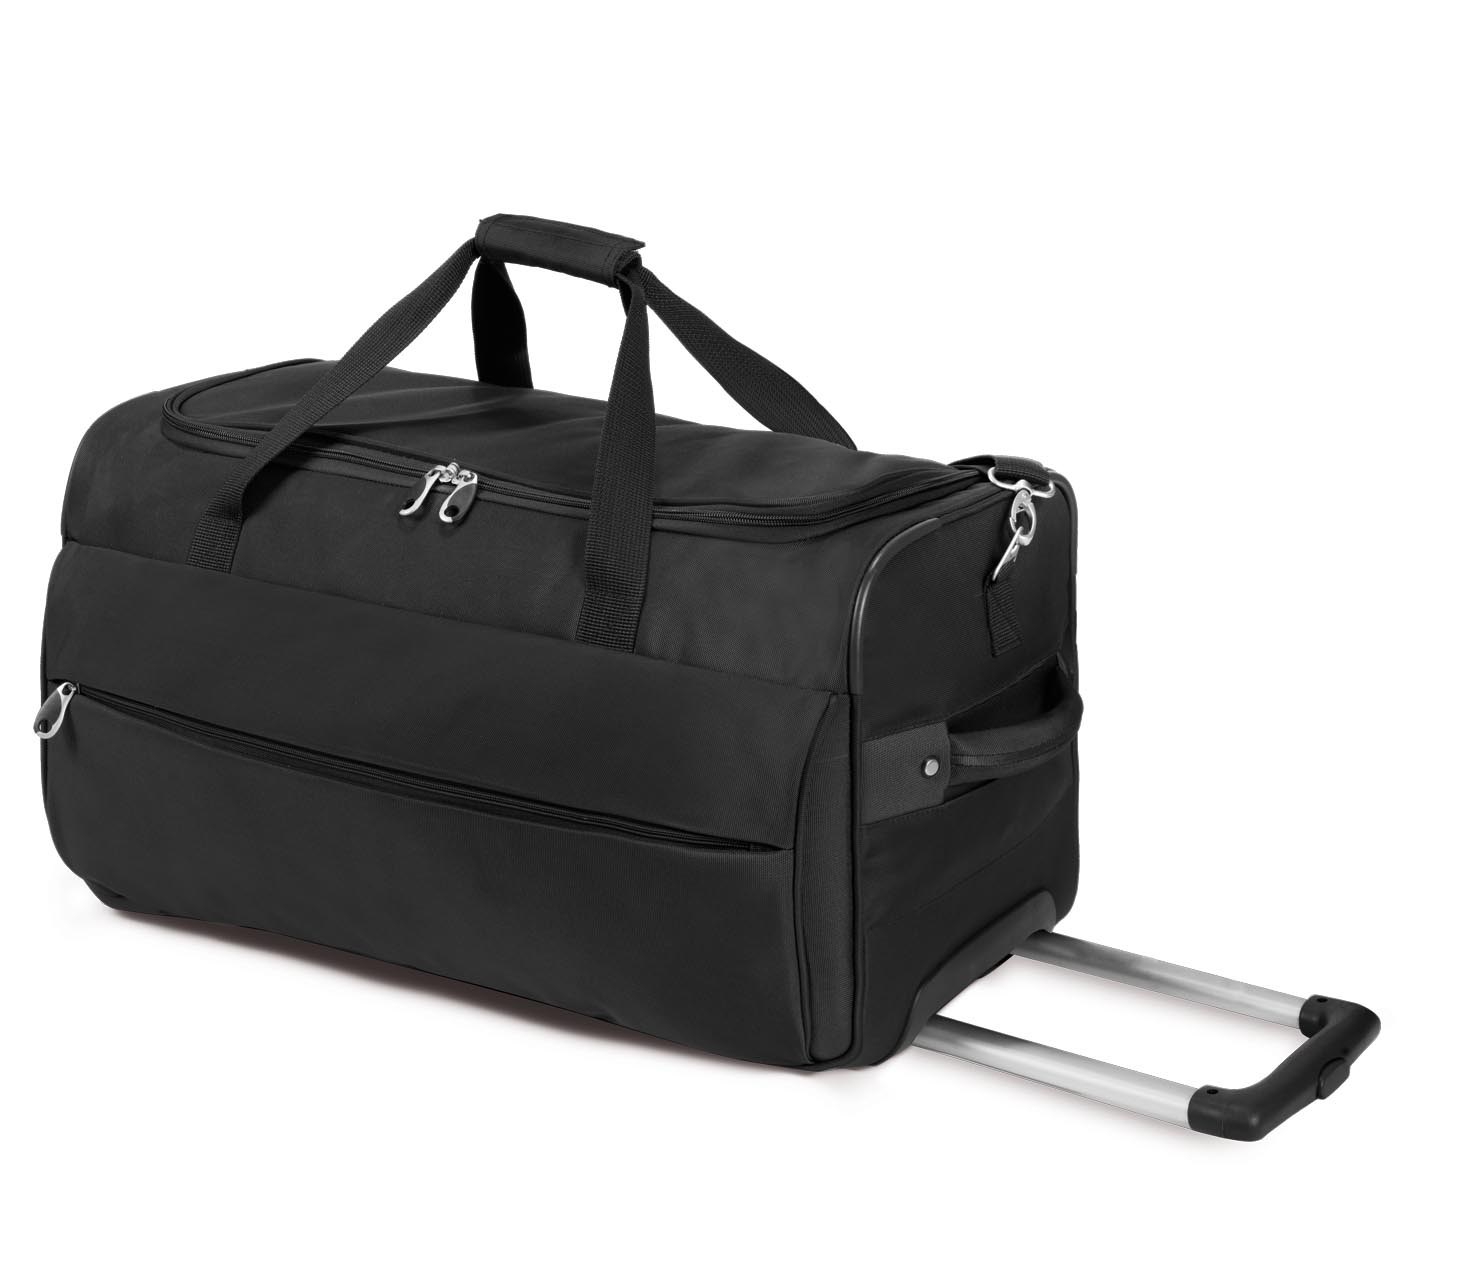 sac voyage trolley